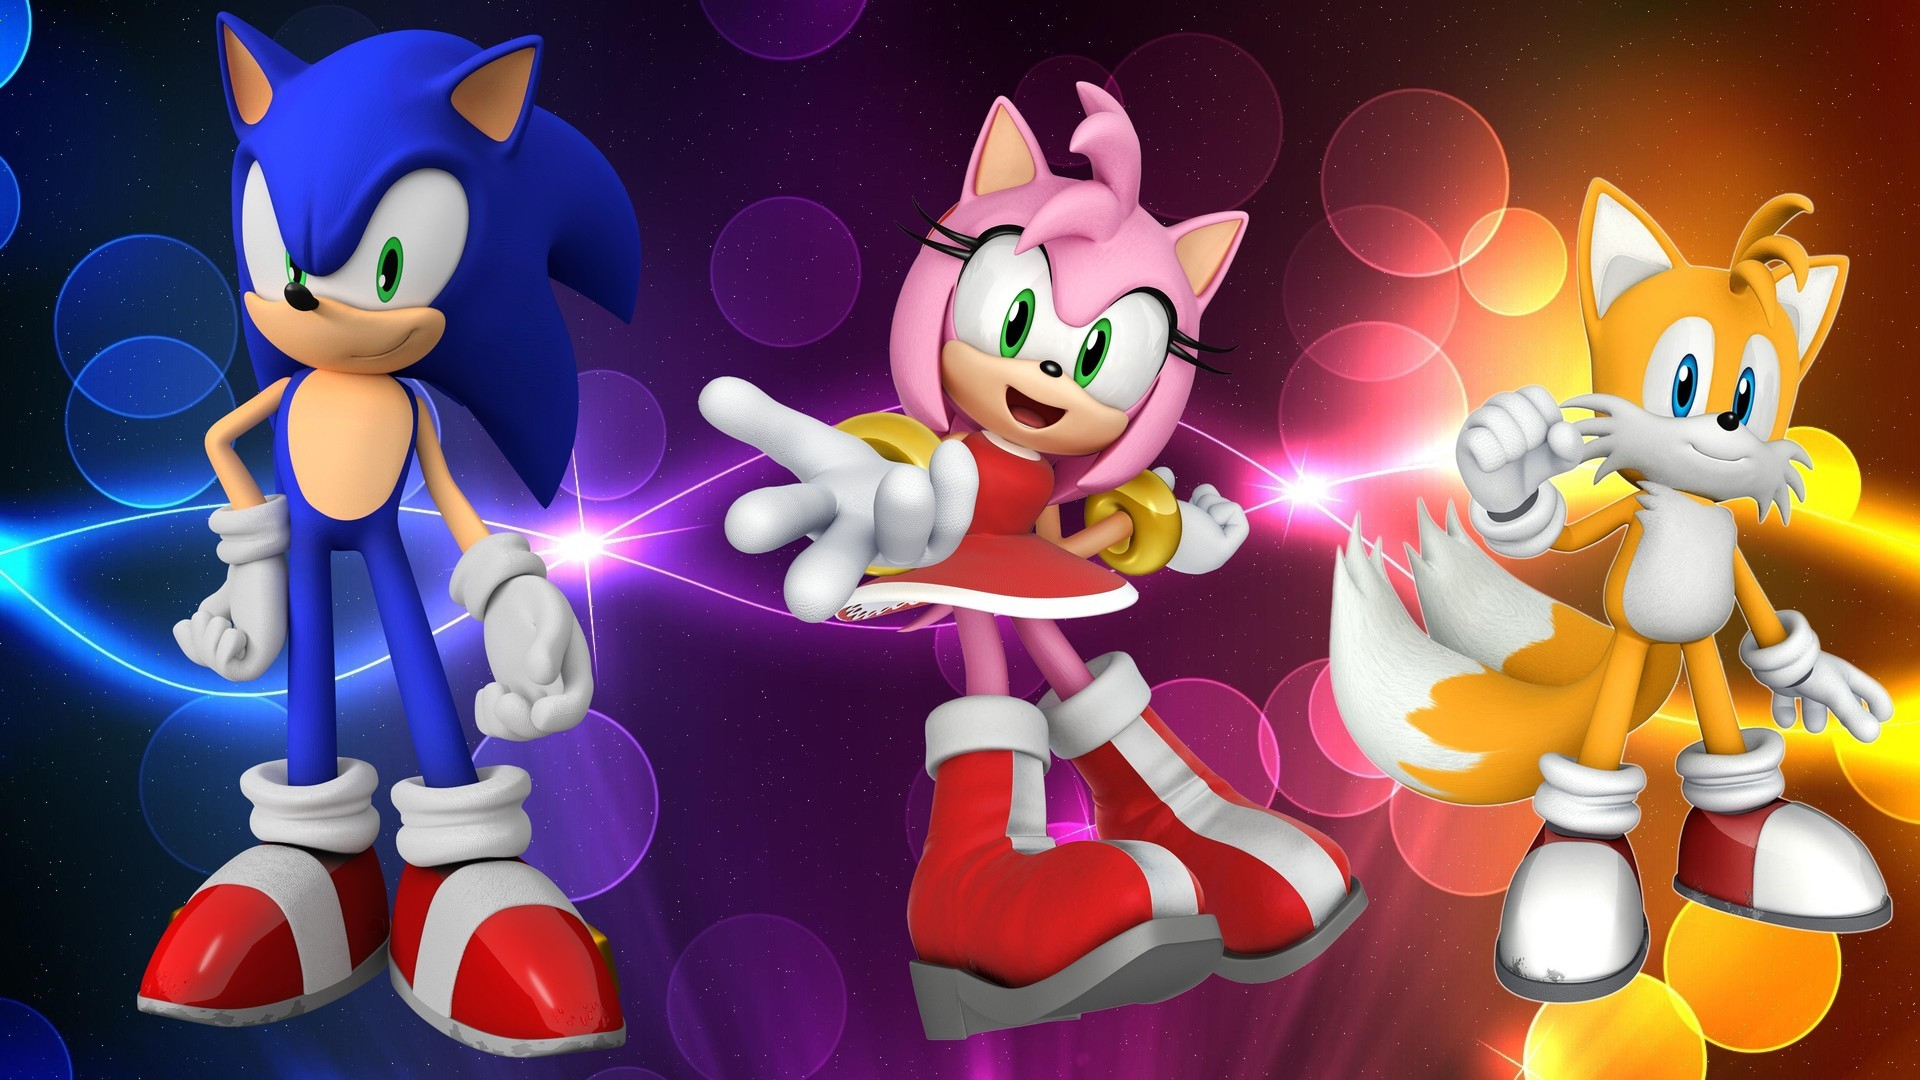 Sonic, Amy & Tails HD Spunky Wallpaper Free HD Wallpaper .